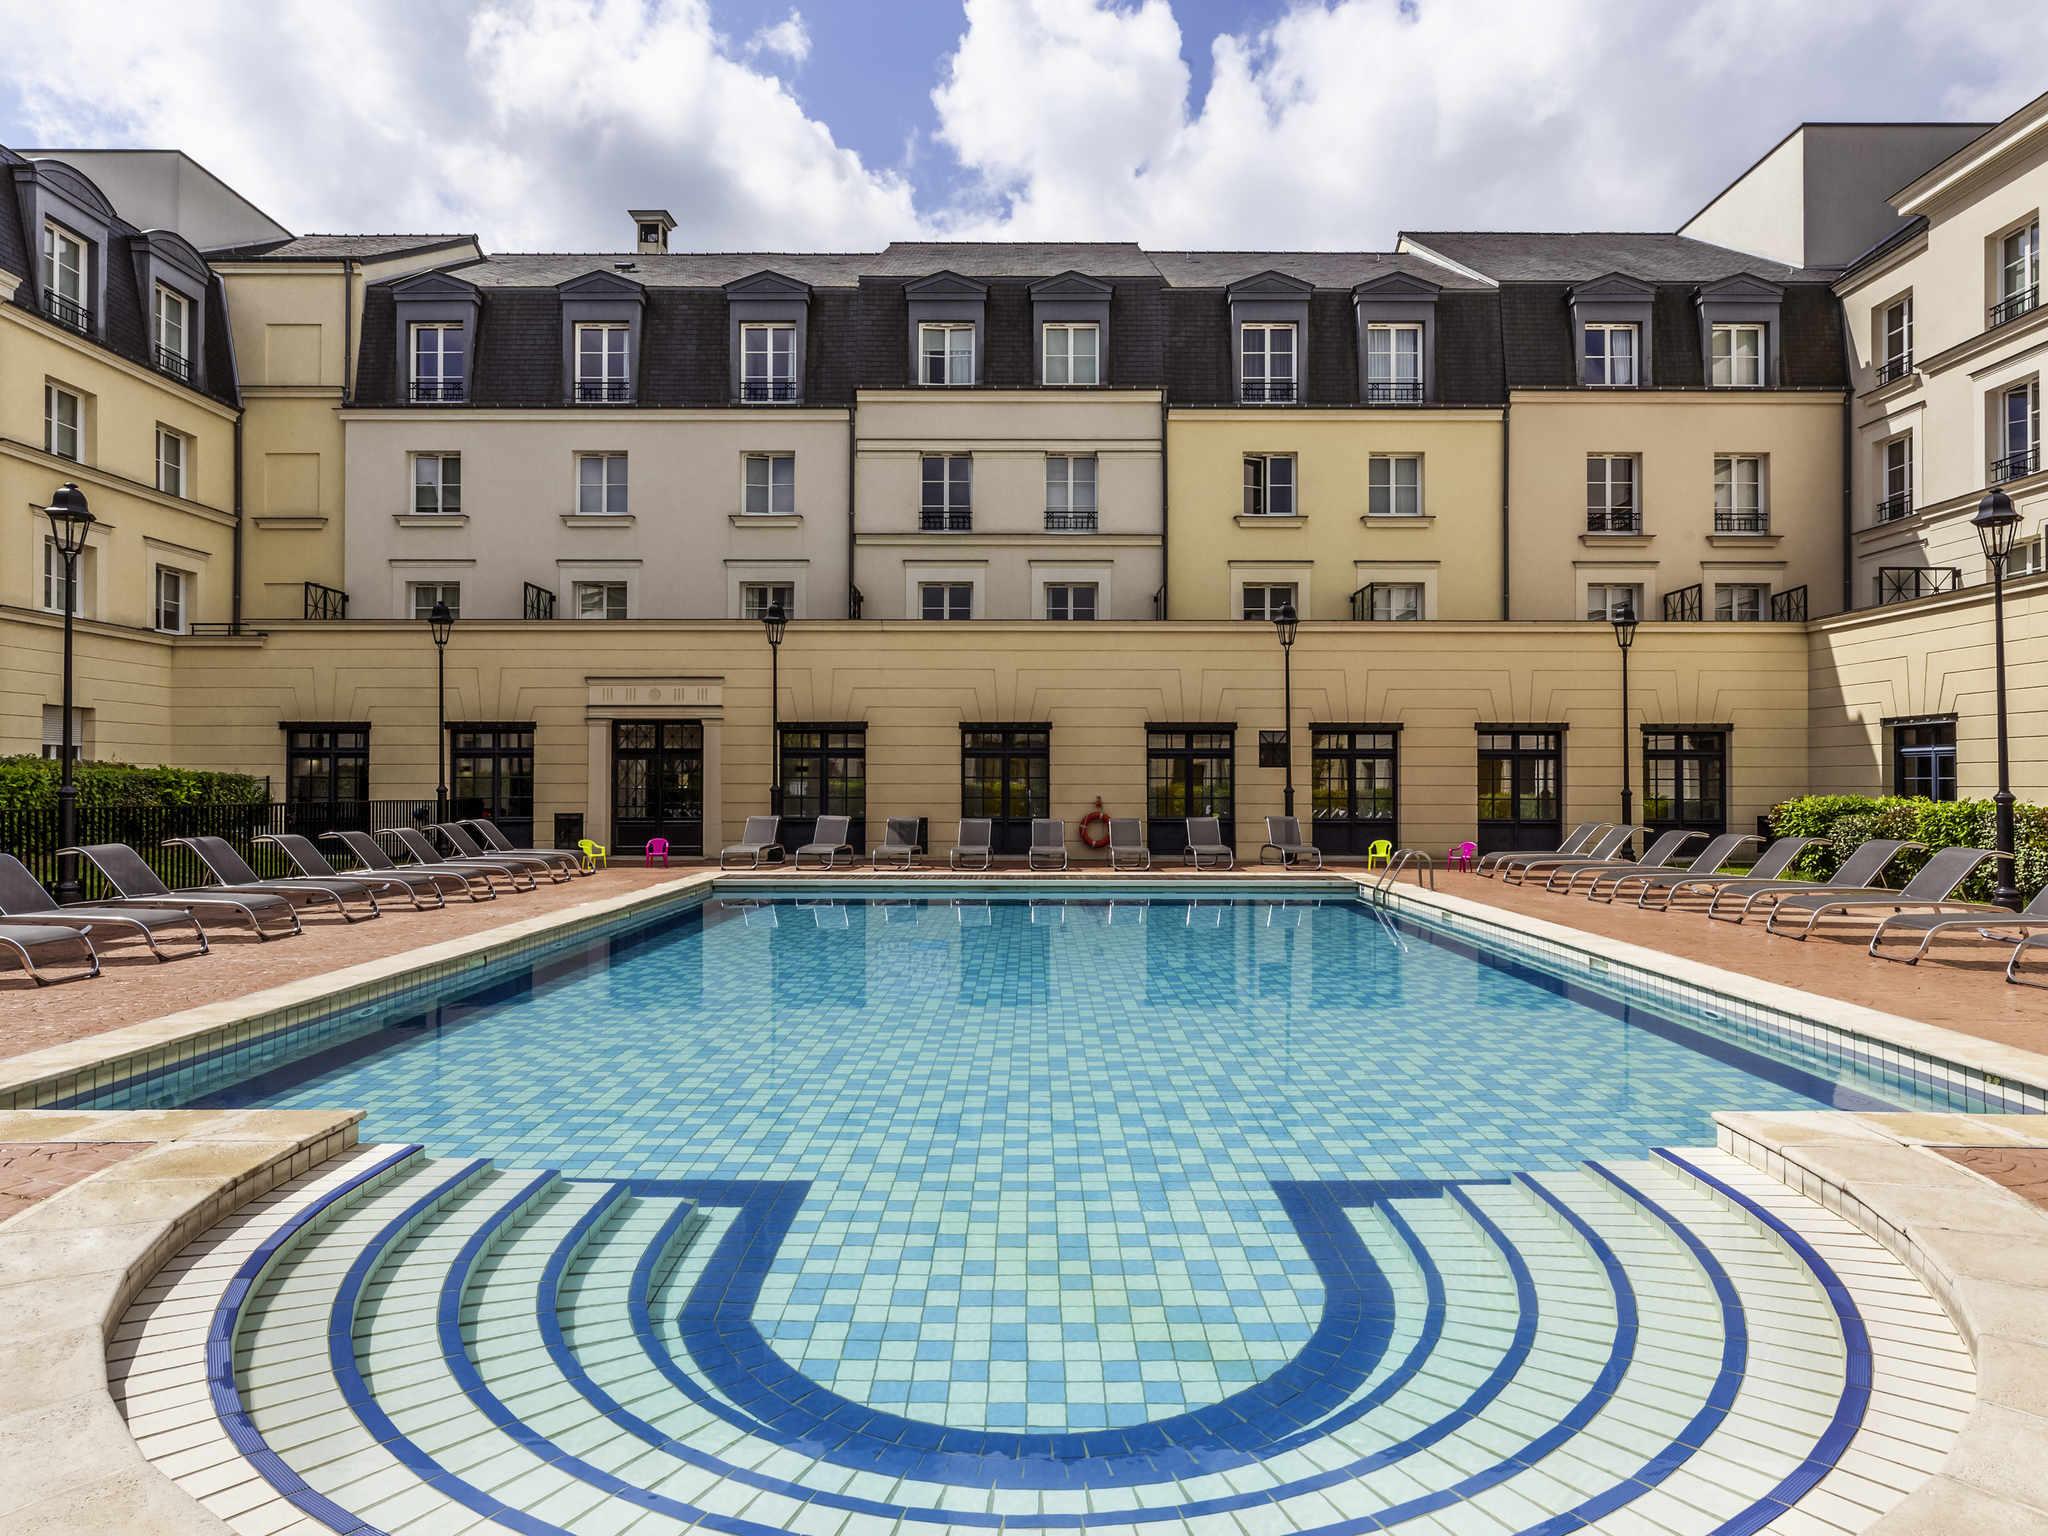 Hotel – Hipark by Adagio Serris - Val d'Europe